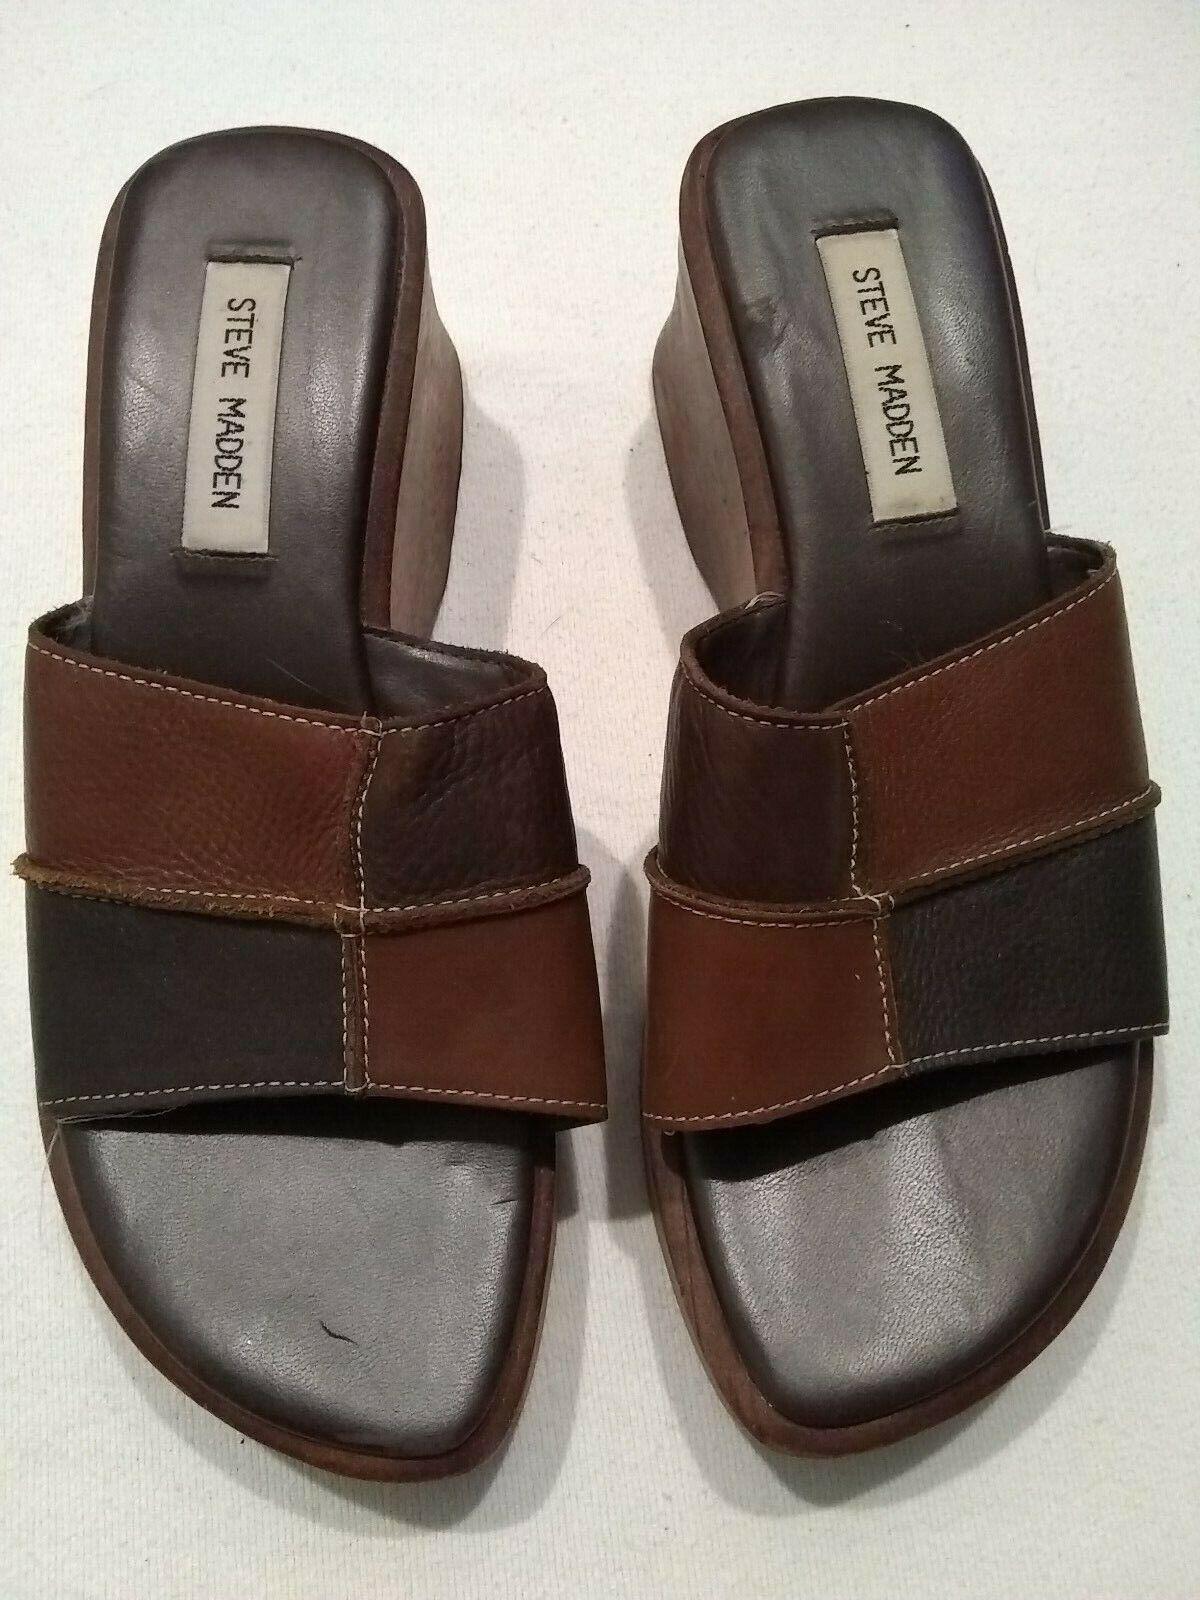 in vendita Steve Madden 9 Patchwork Leather Leather Leather and Wood Platform Wedge scarpe  risparmia fino al 30-50% di sconto